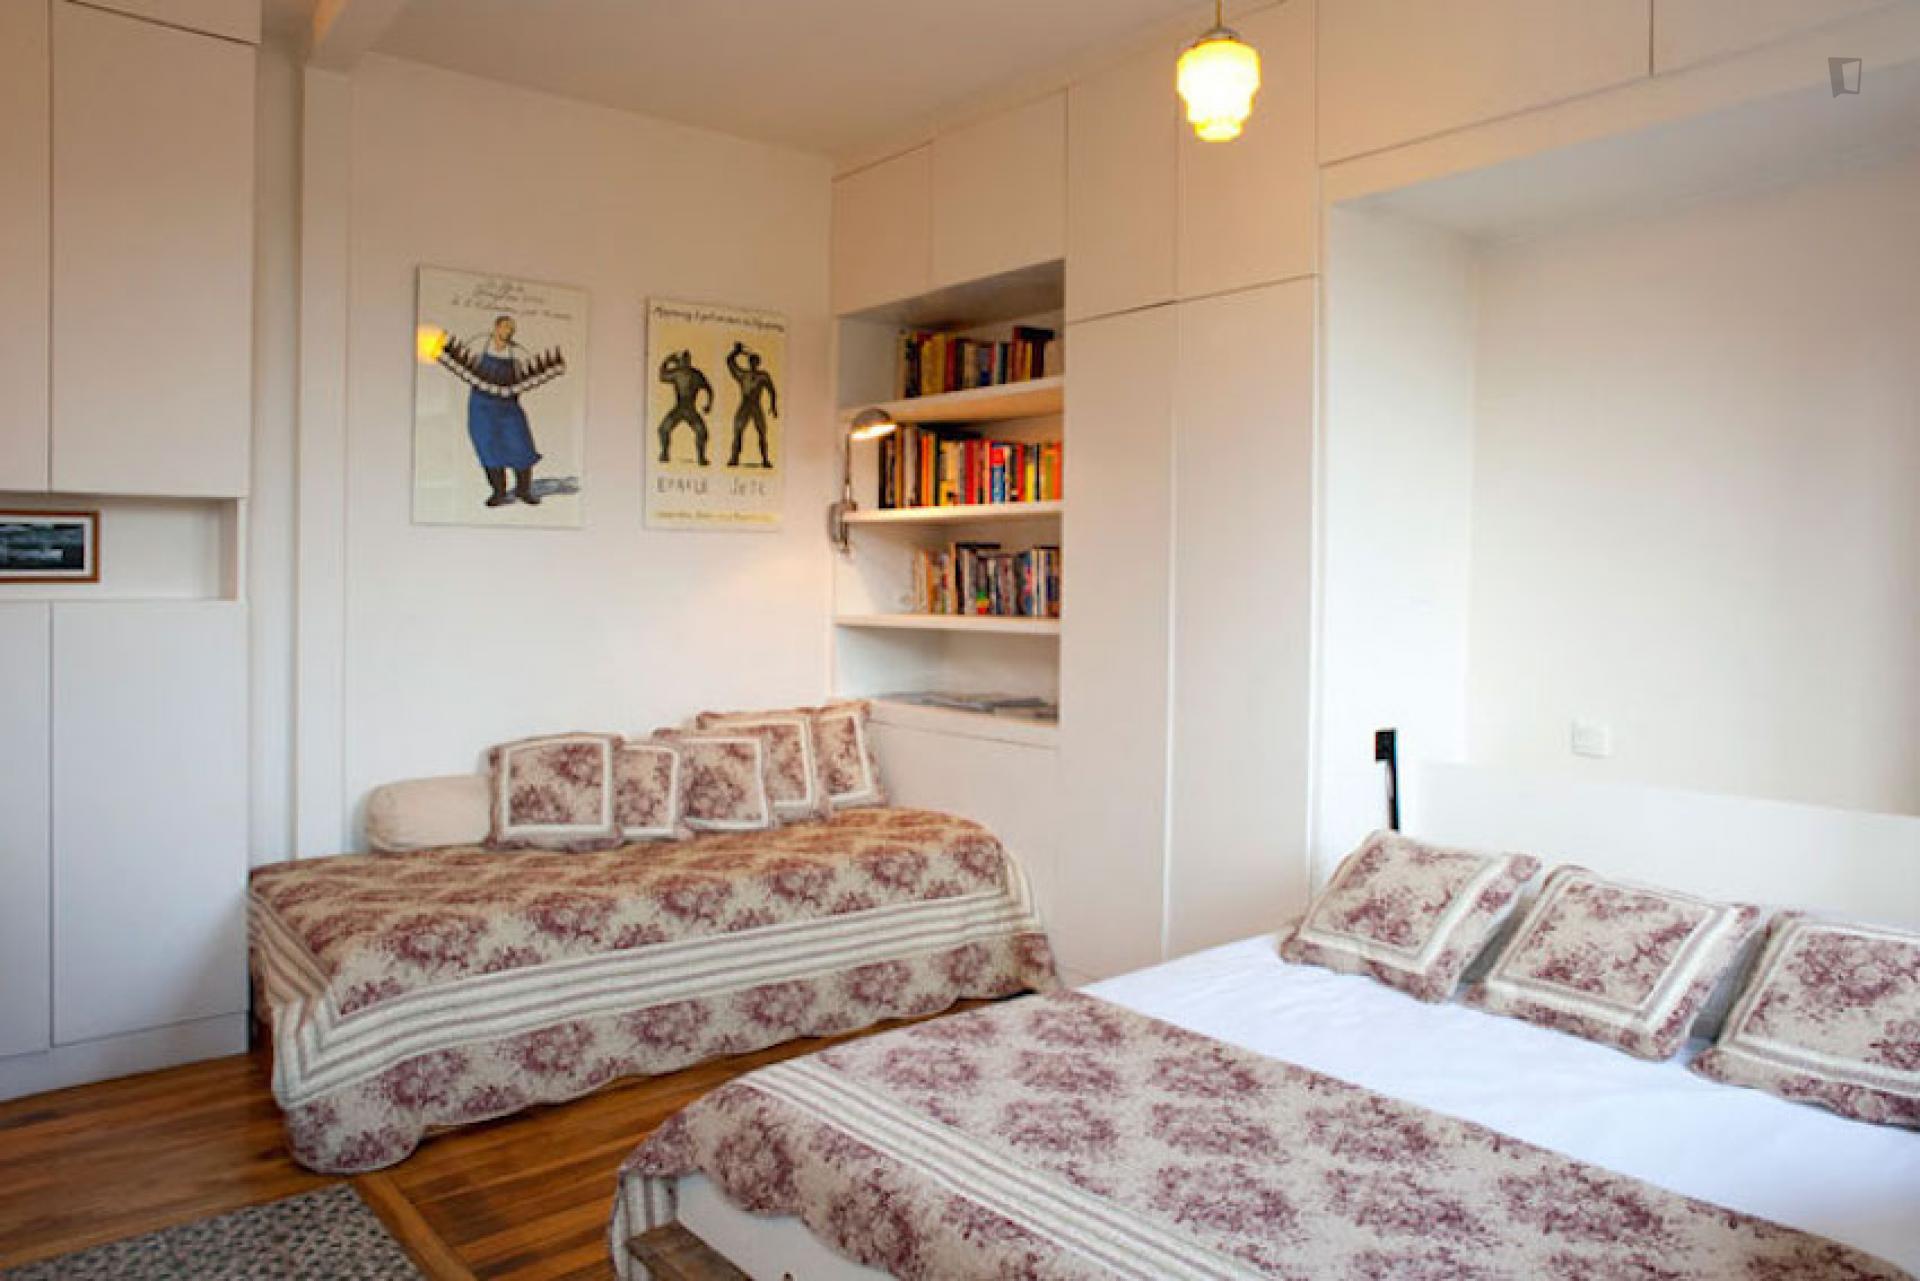 Saint-OuenSaint-Ouen- Elegant Studio Apartment in Paris- Elegant Studio Apartment in Paris